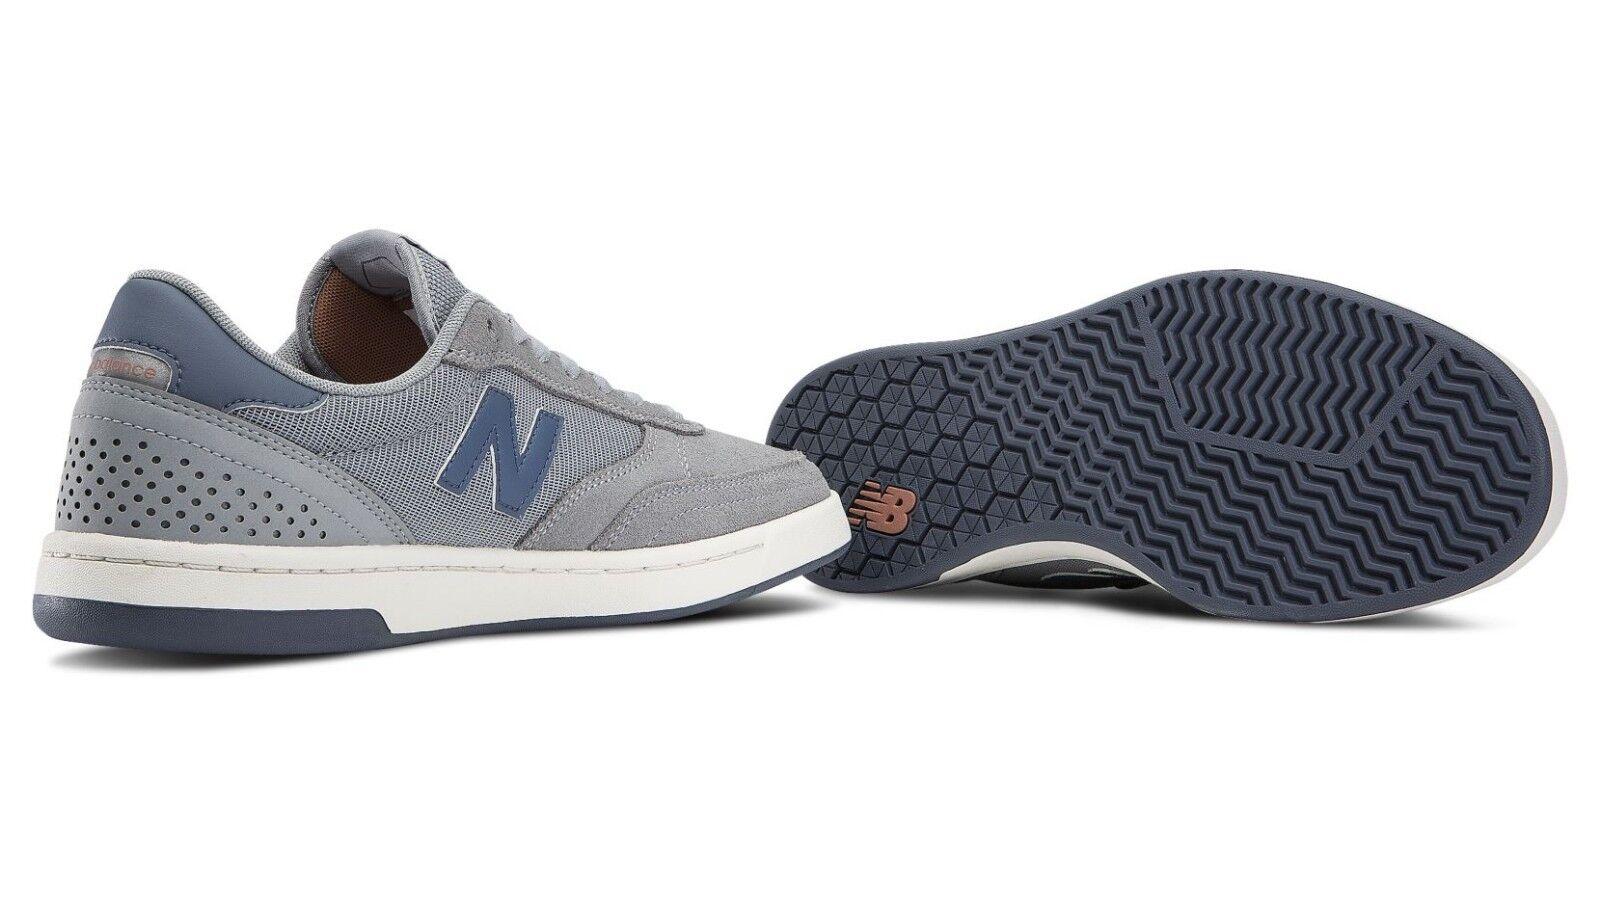 Uomo nuovo scarpe equilibrio numerico skateboard scarpe nuovo grey marina (grg) aa6372